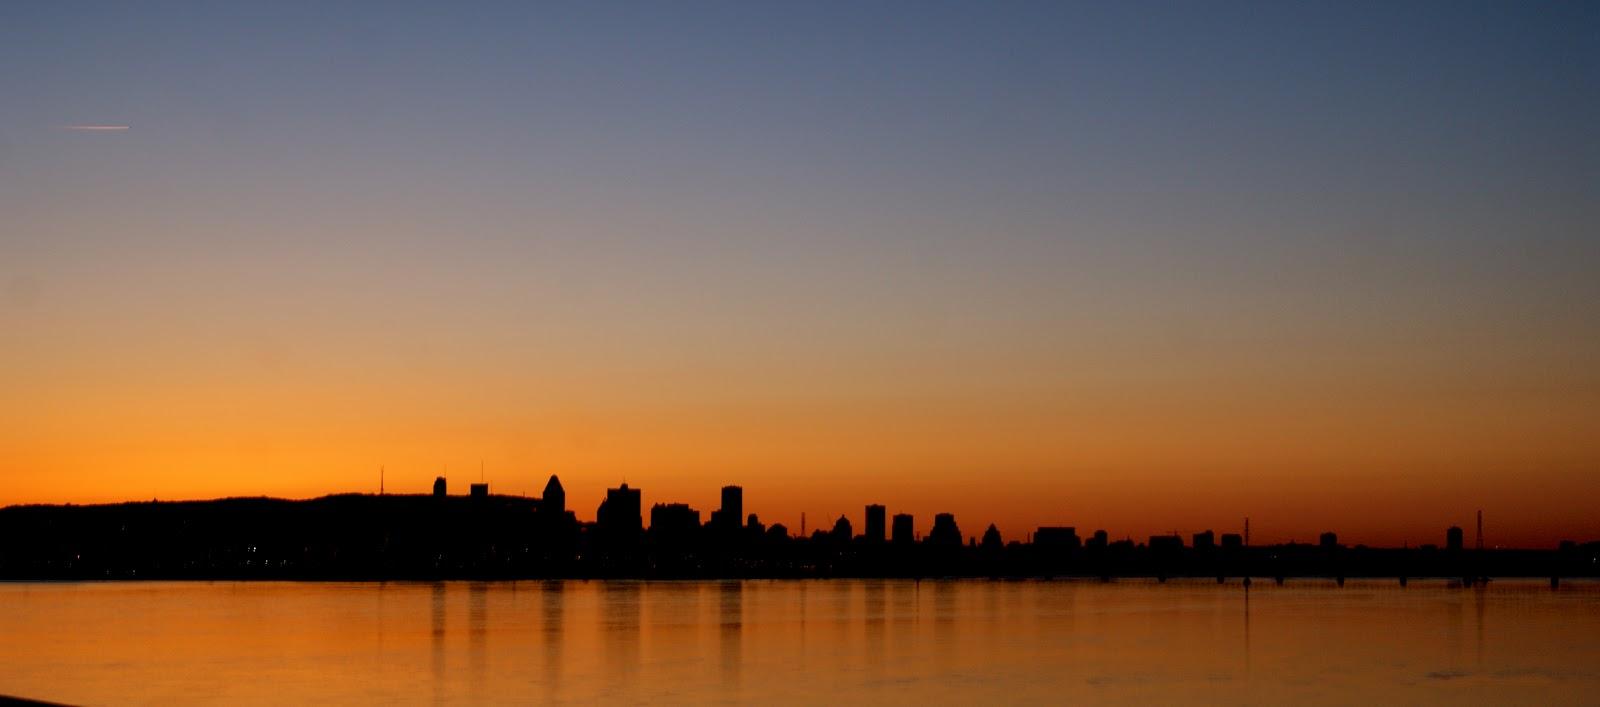 Province canadienne week end dans le western new england - Coucher de soleil montreal ...